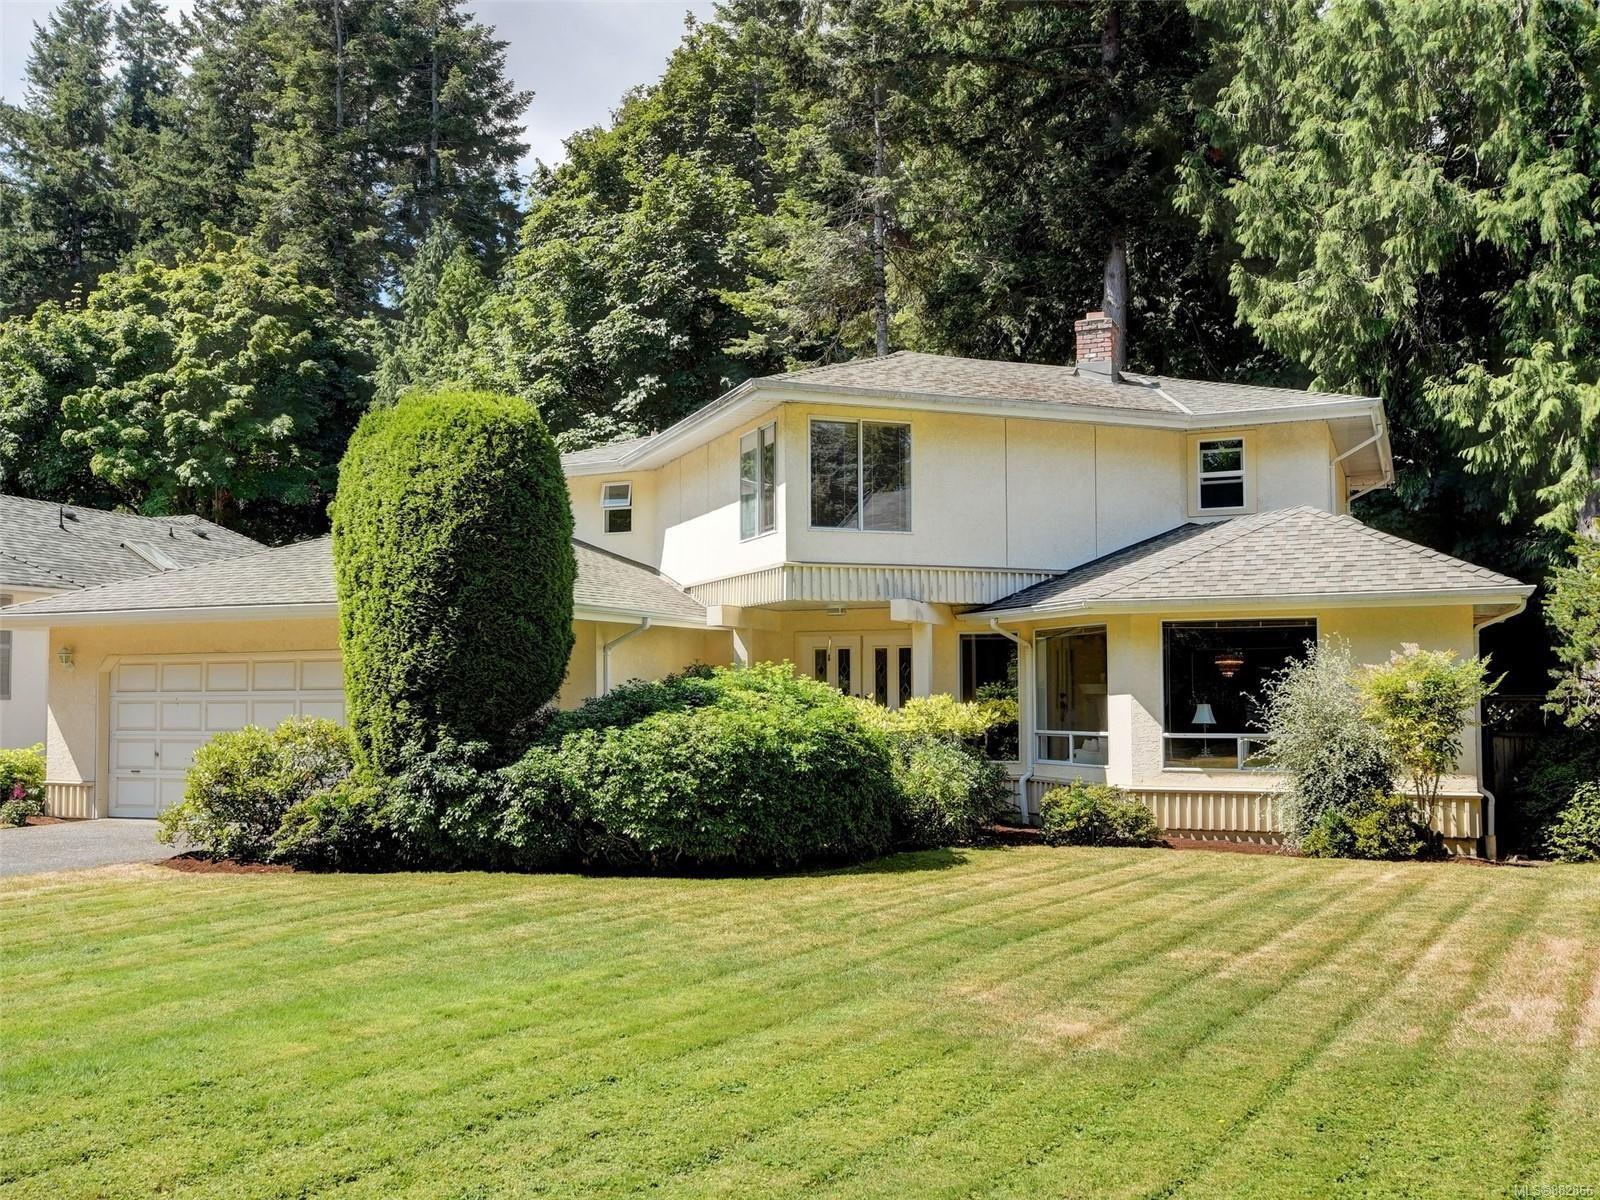 Main Photo: 4682 Lochside Dr in : SE Broadmead House for sale (Saanich East)  : MLS®# 882866